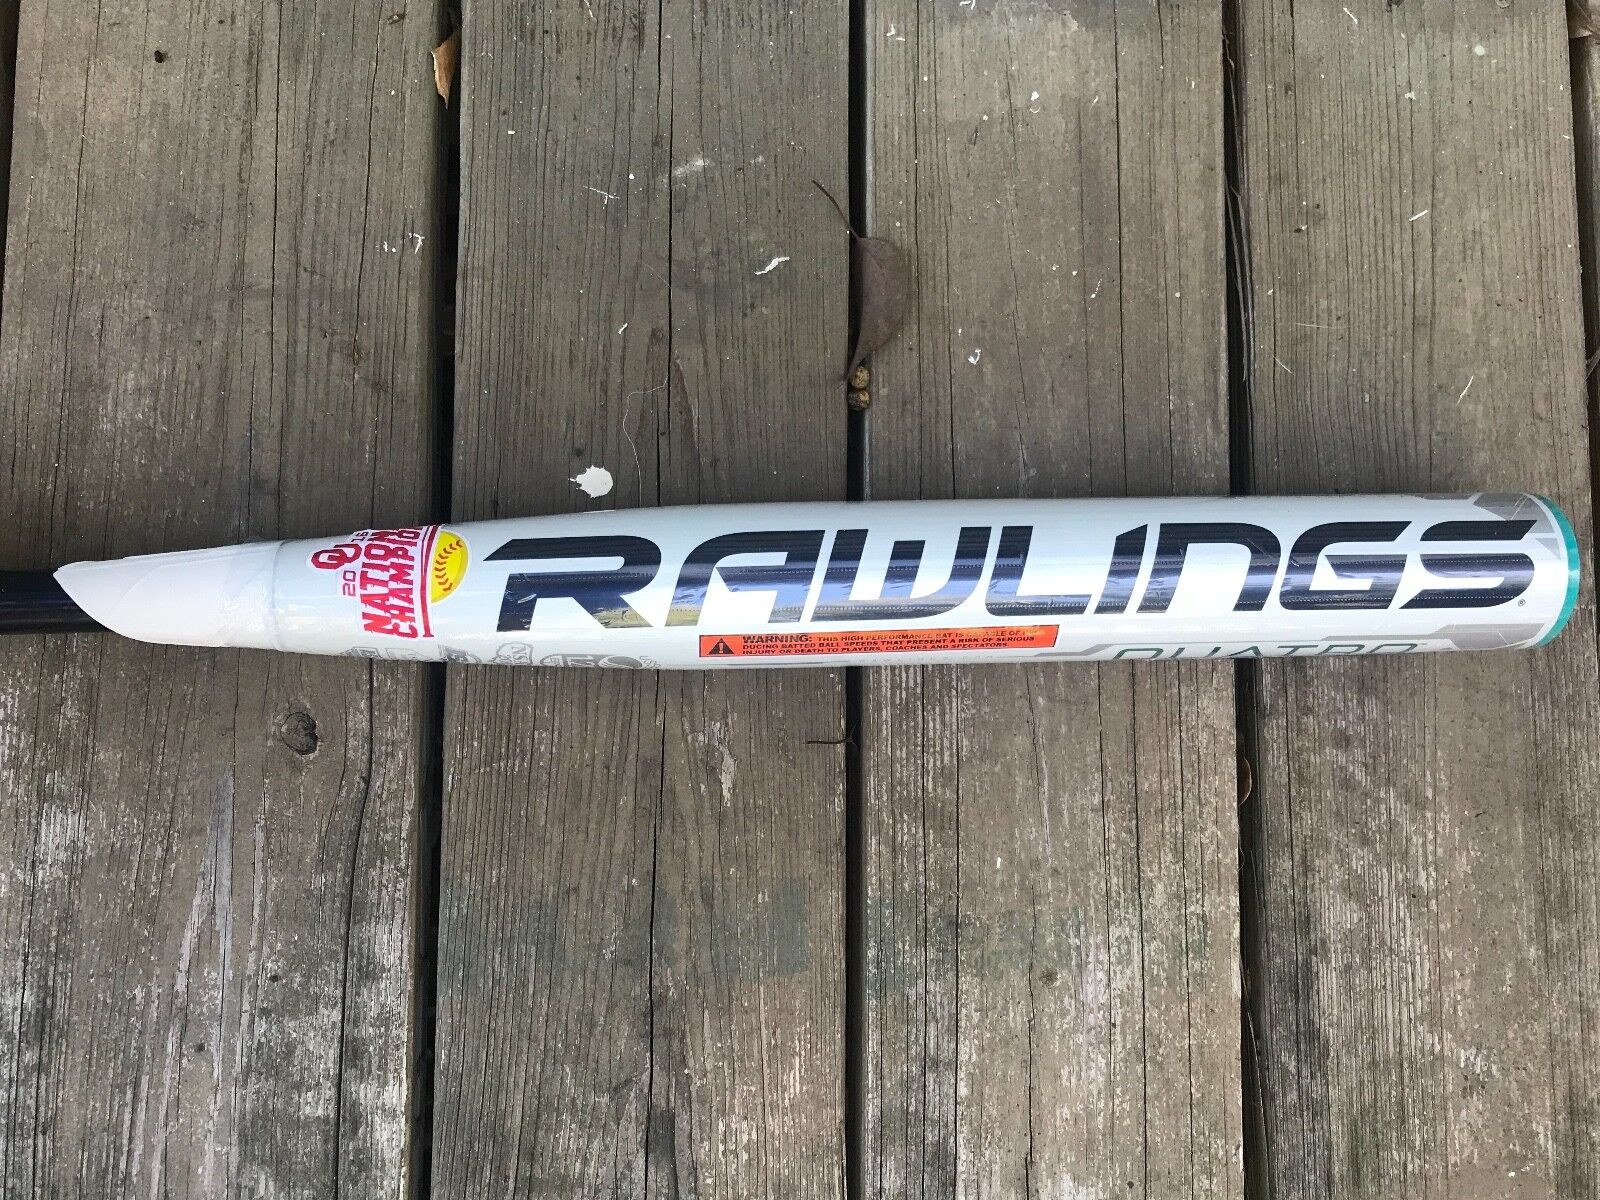 Rawlings Quatro -10 Softball Bat size 33/24 Brand new in wrapper